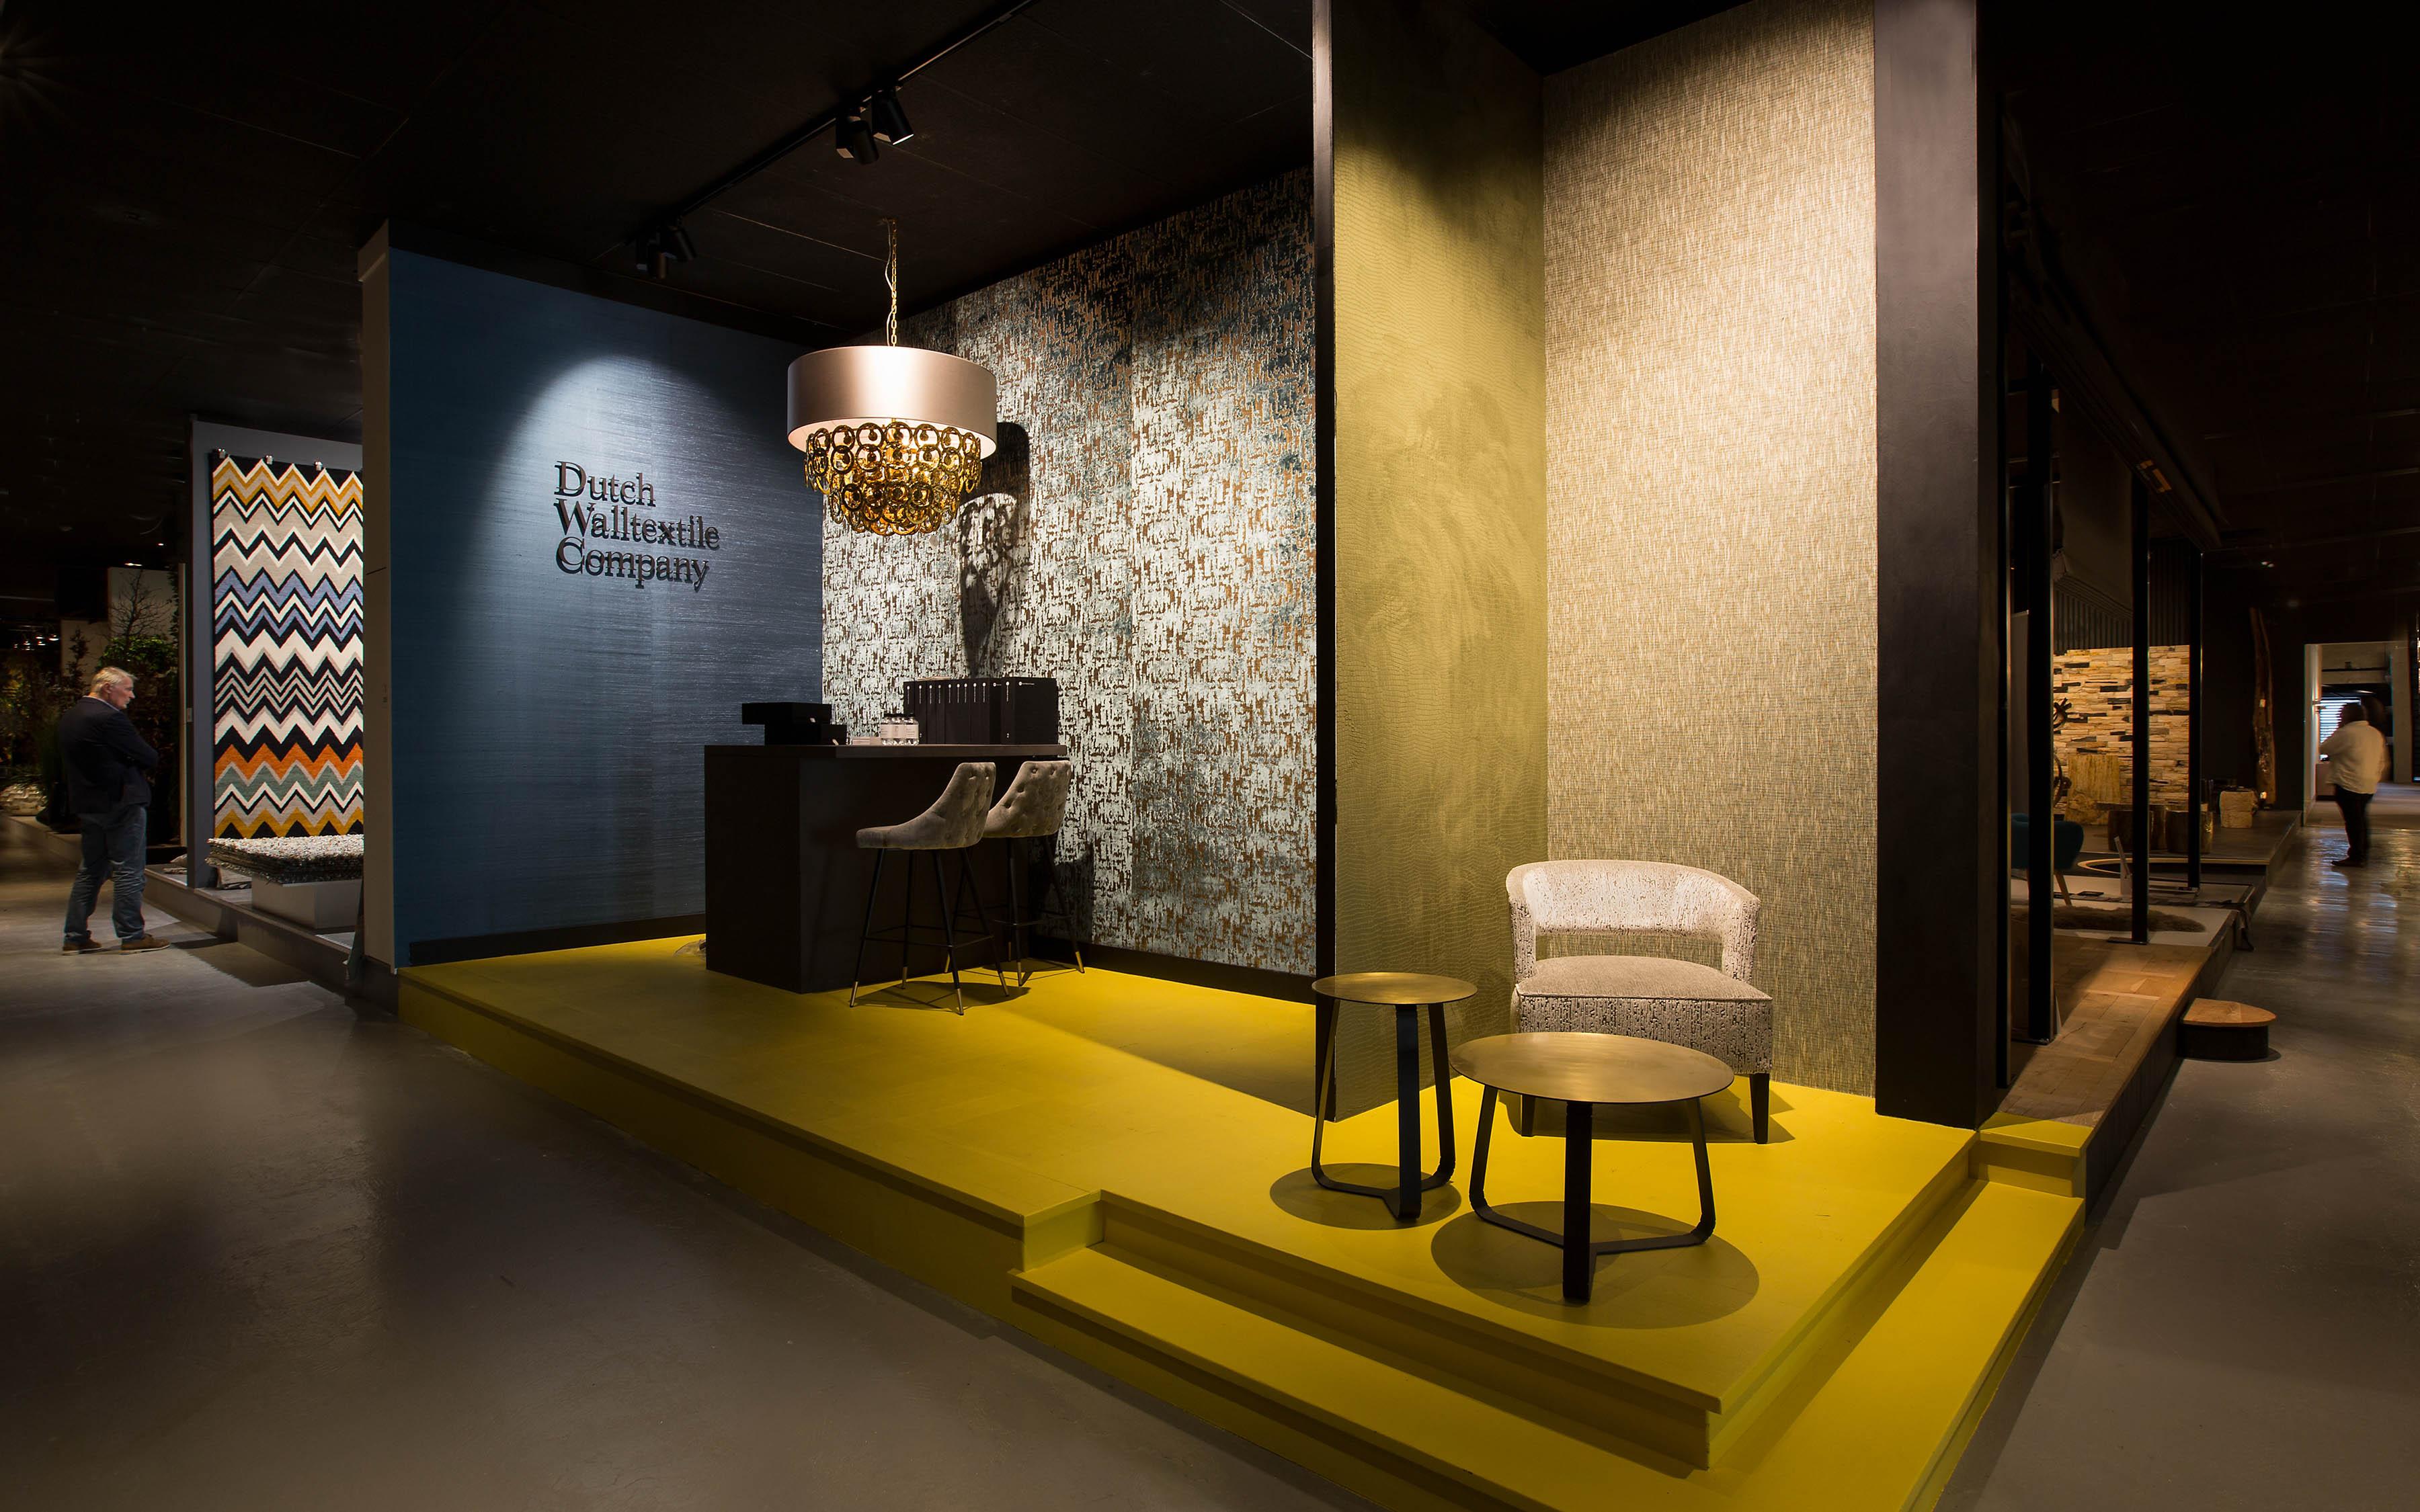 De Dutch Walltextile Company Showroom en ETC Design Centre Europe